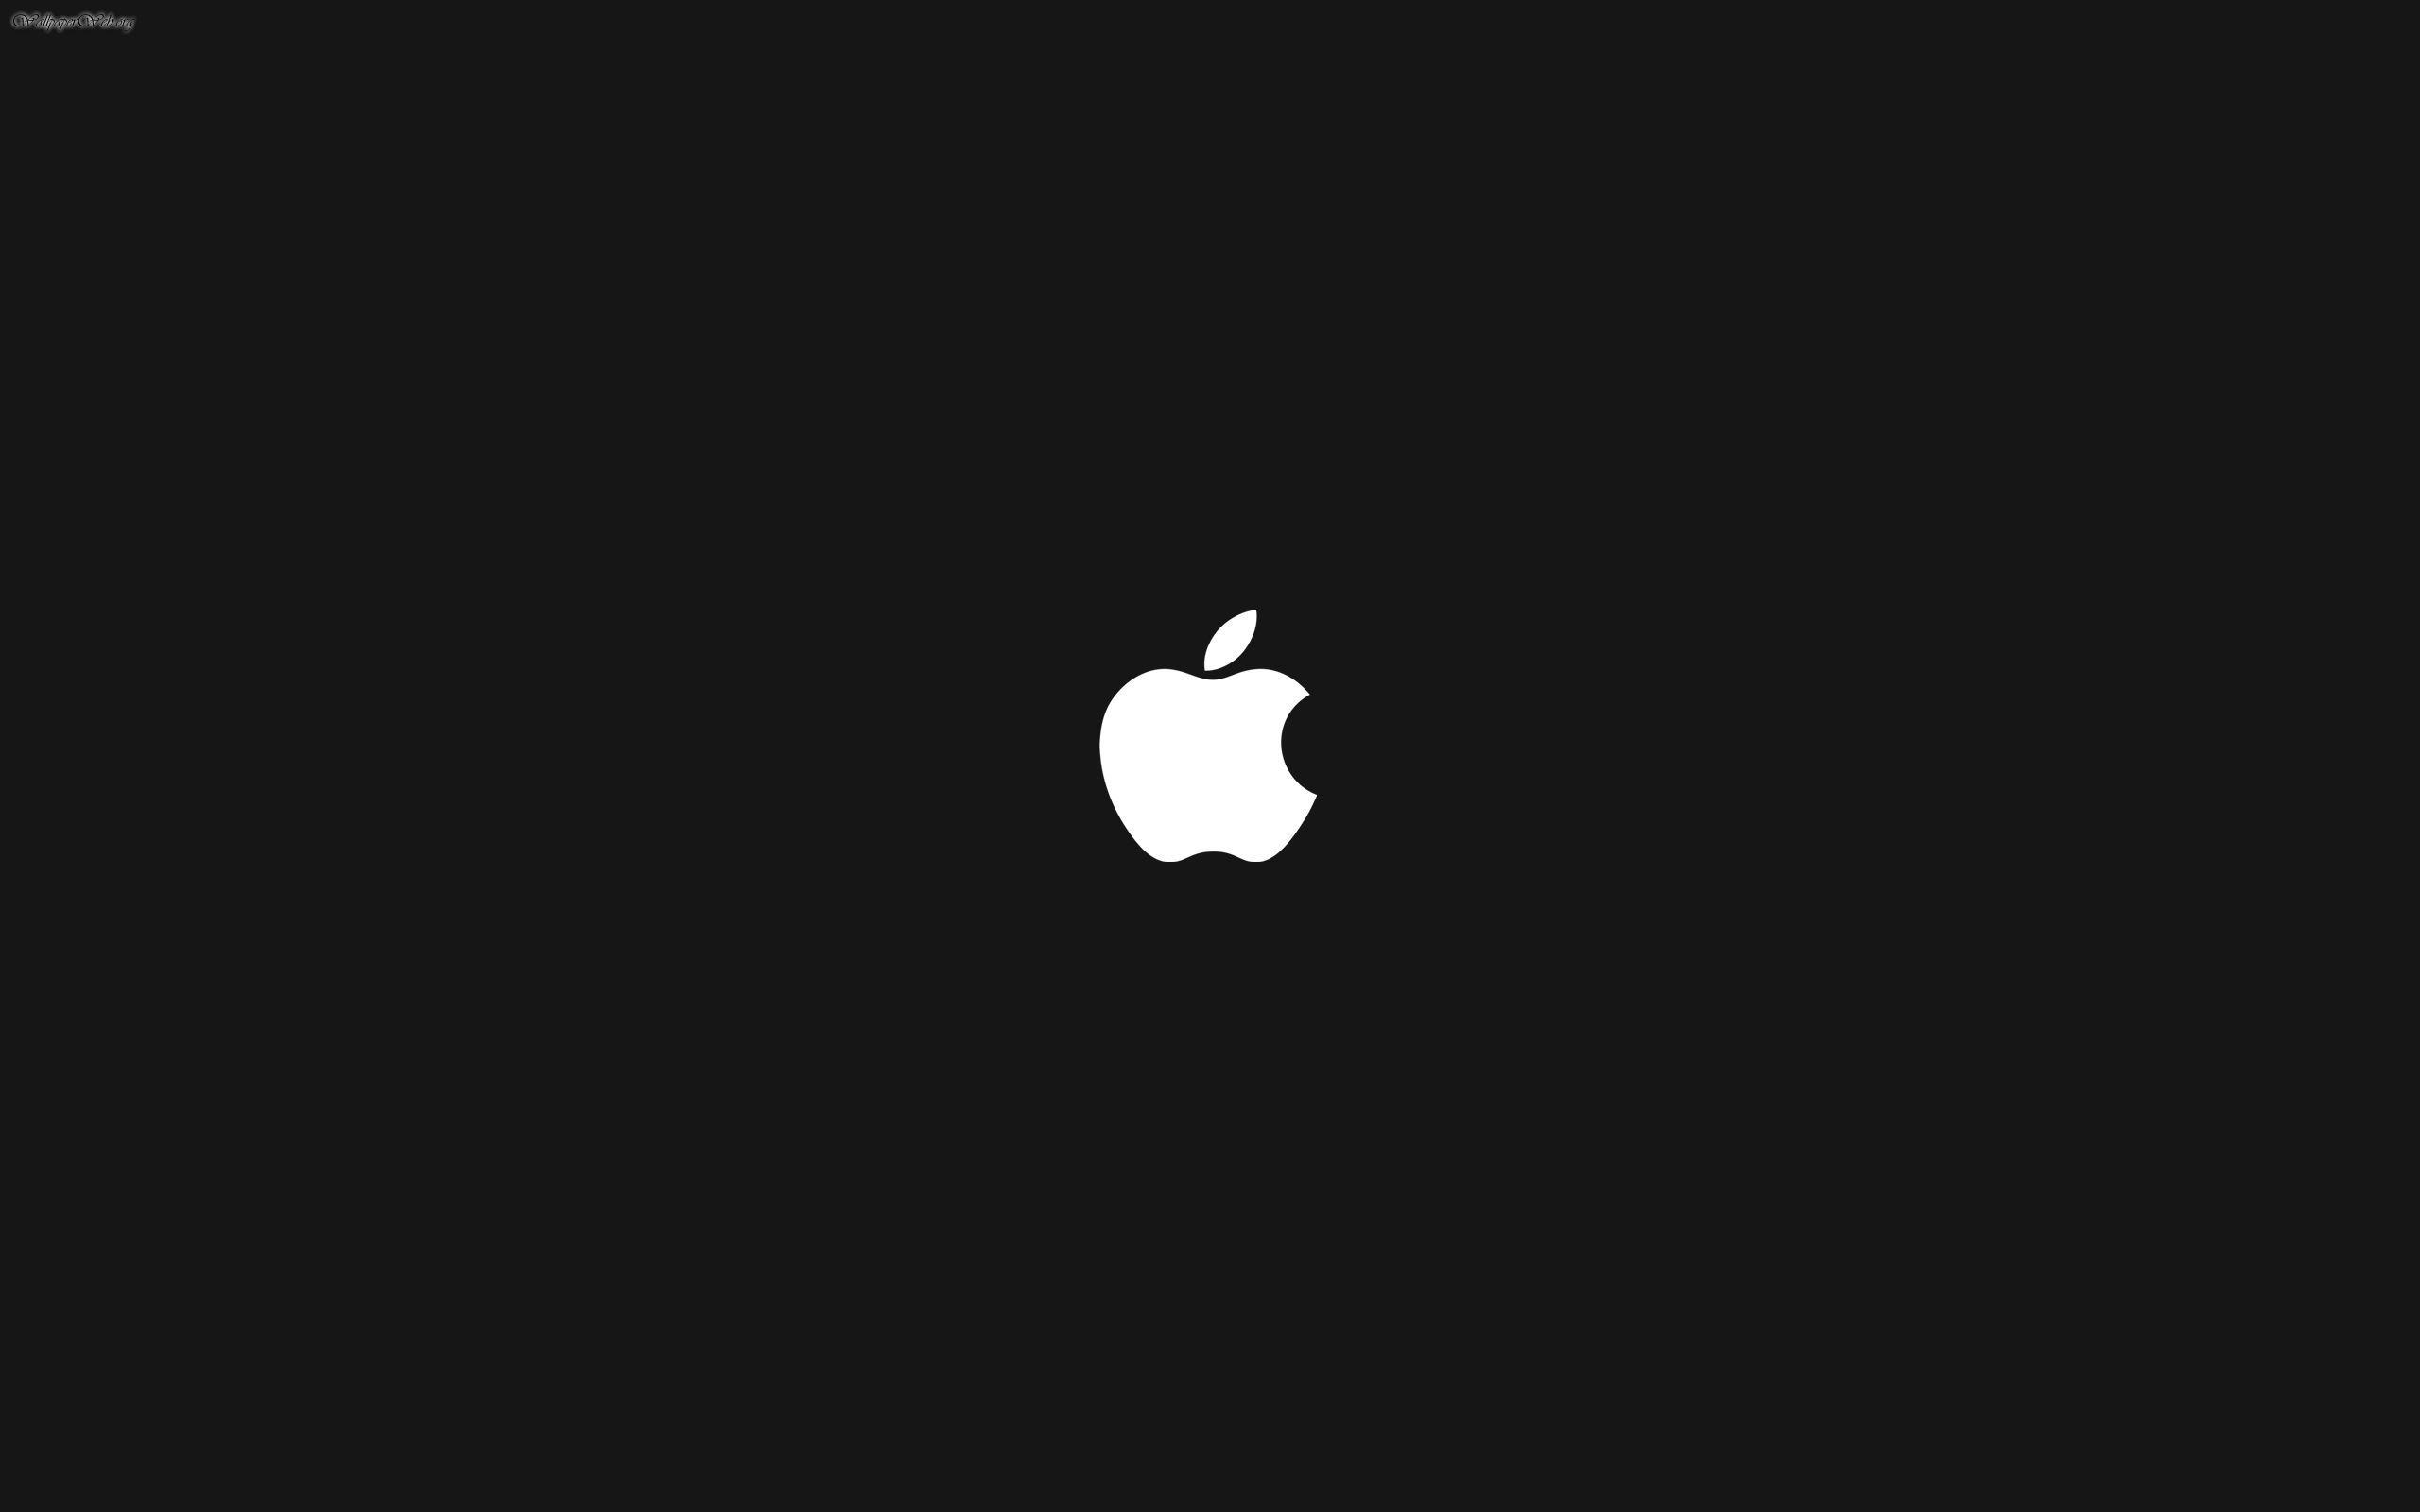 Apple Logo black Computer 2560x1600